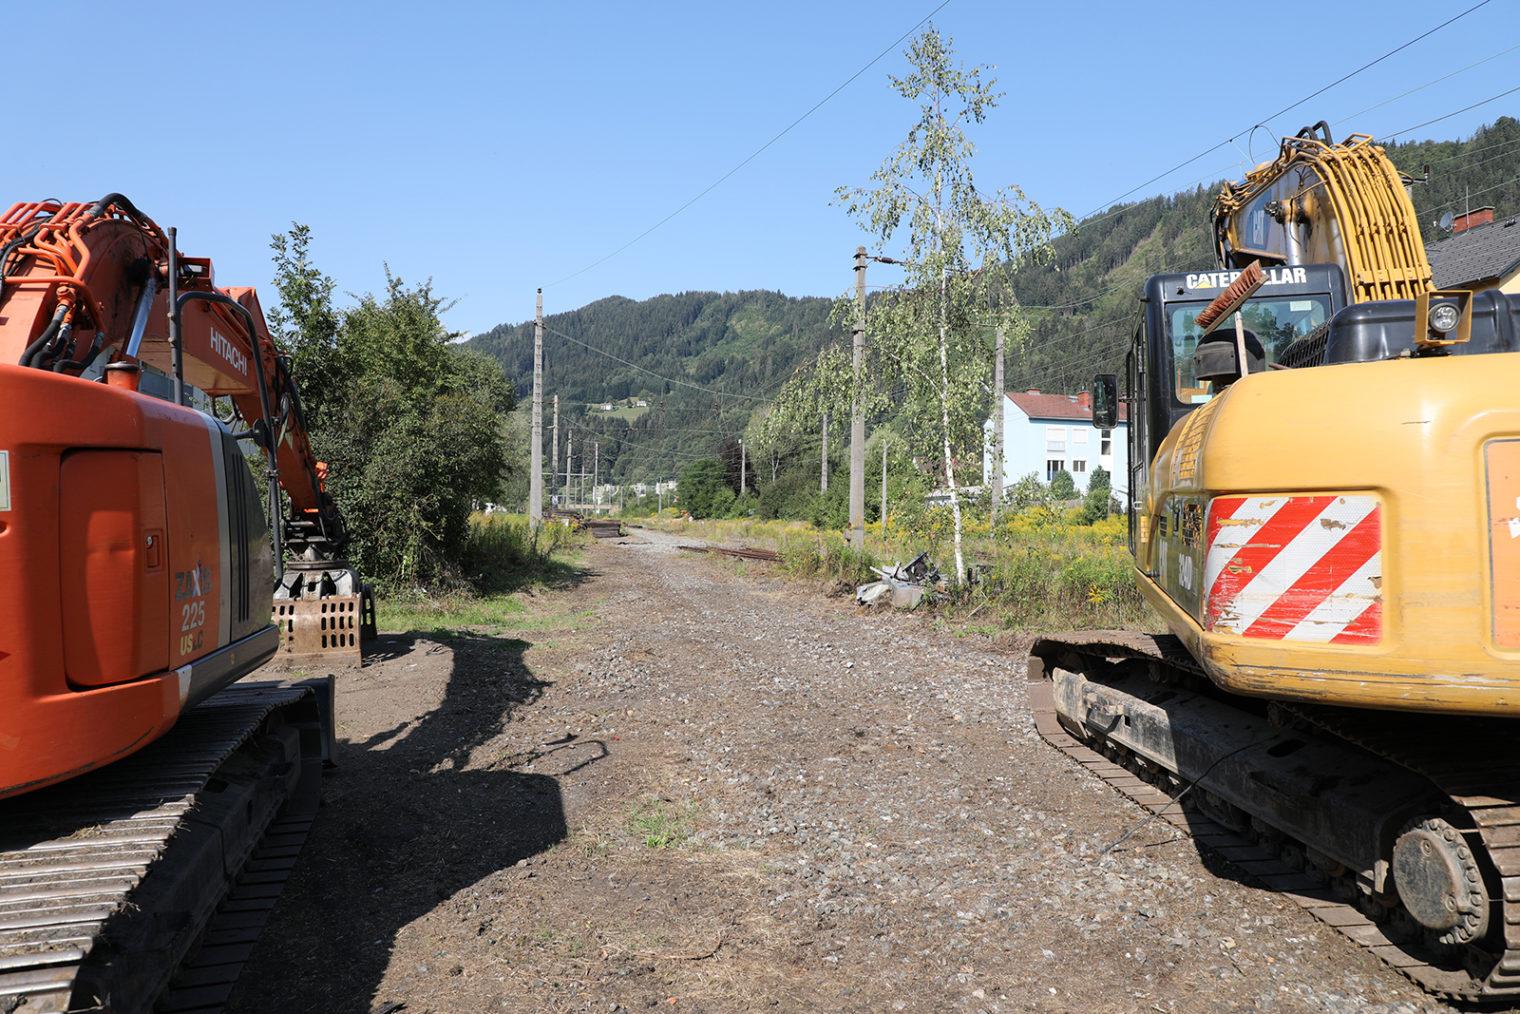 Ehemaligen Bahntrasse in Leoben-Hinterberg